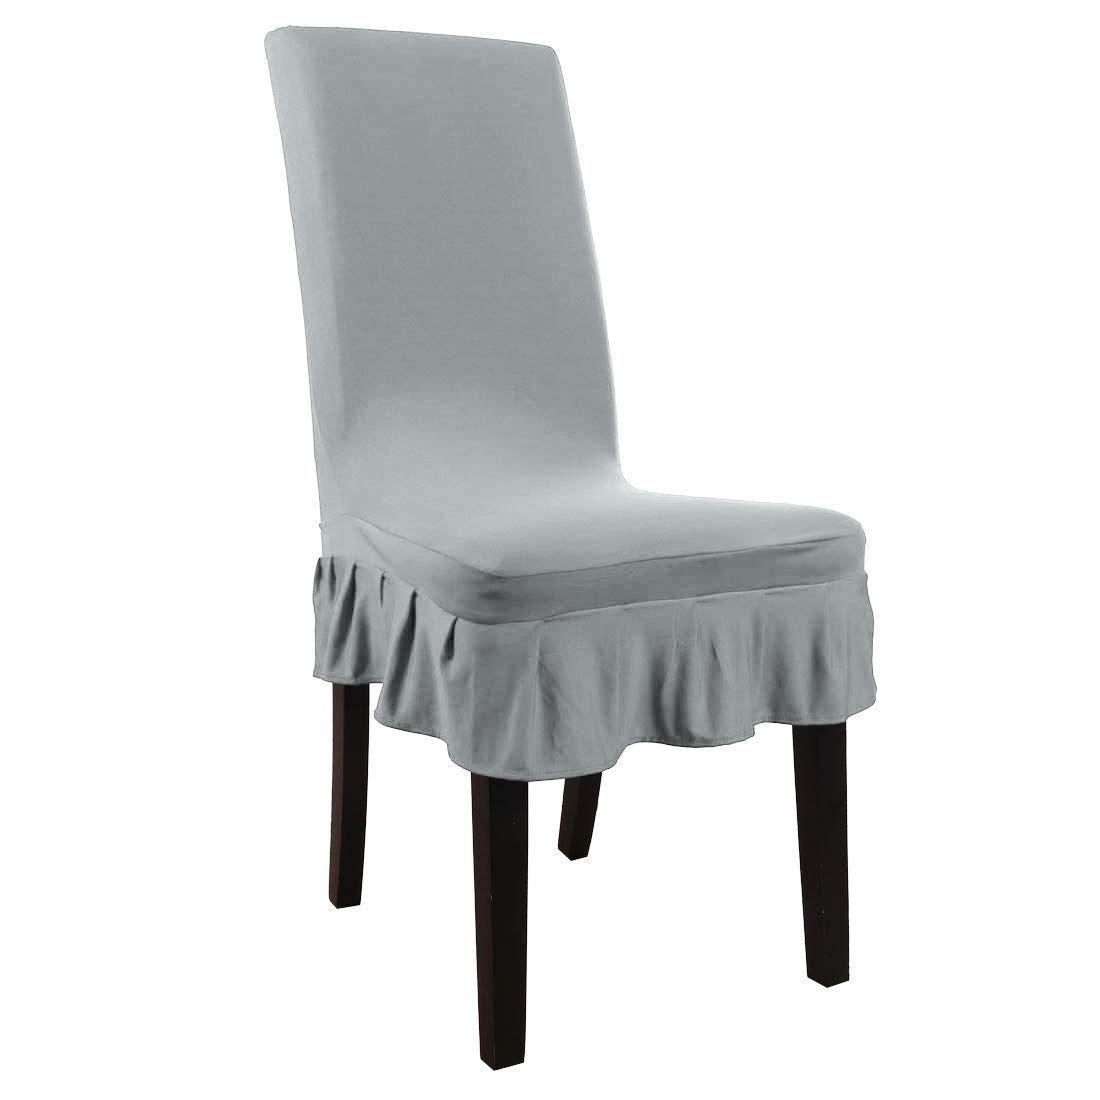 Sensational Buy Dealmux Dining Chair Covers Ruffled Skirt Stool Ncnpc Chair Design For Home Ncnpcorg